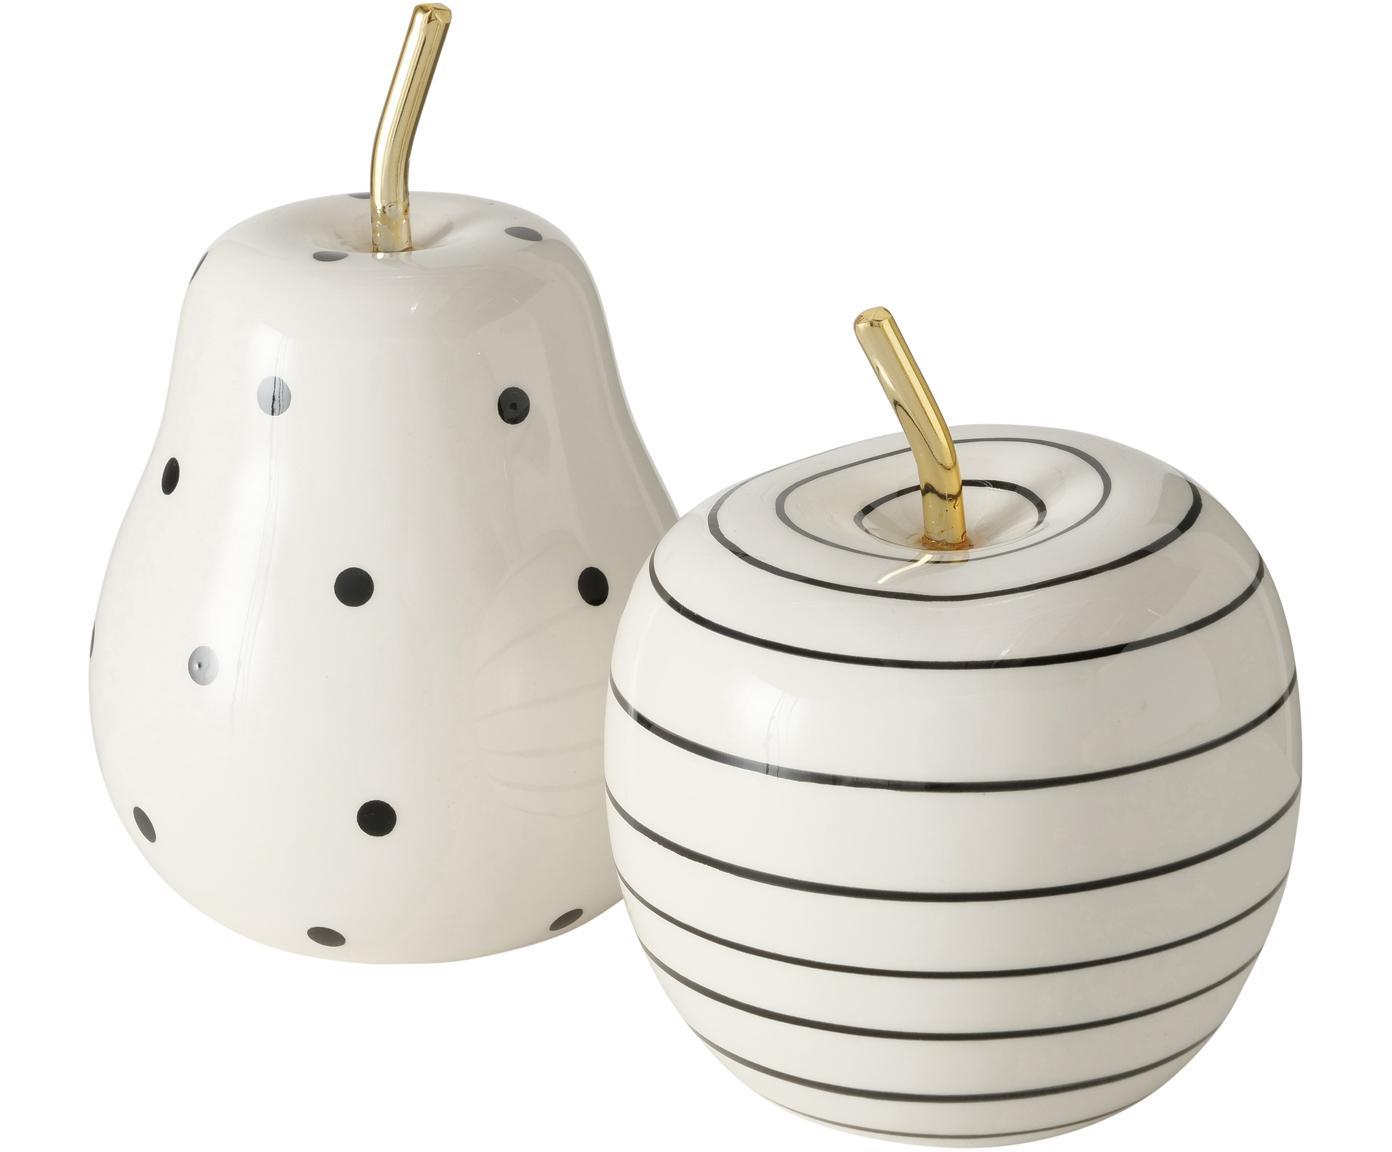 Deko-Objekte-Set Primy, 2-tlg., Dolomit, Weiß, Ø 10 x H 15 cm